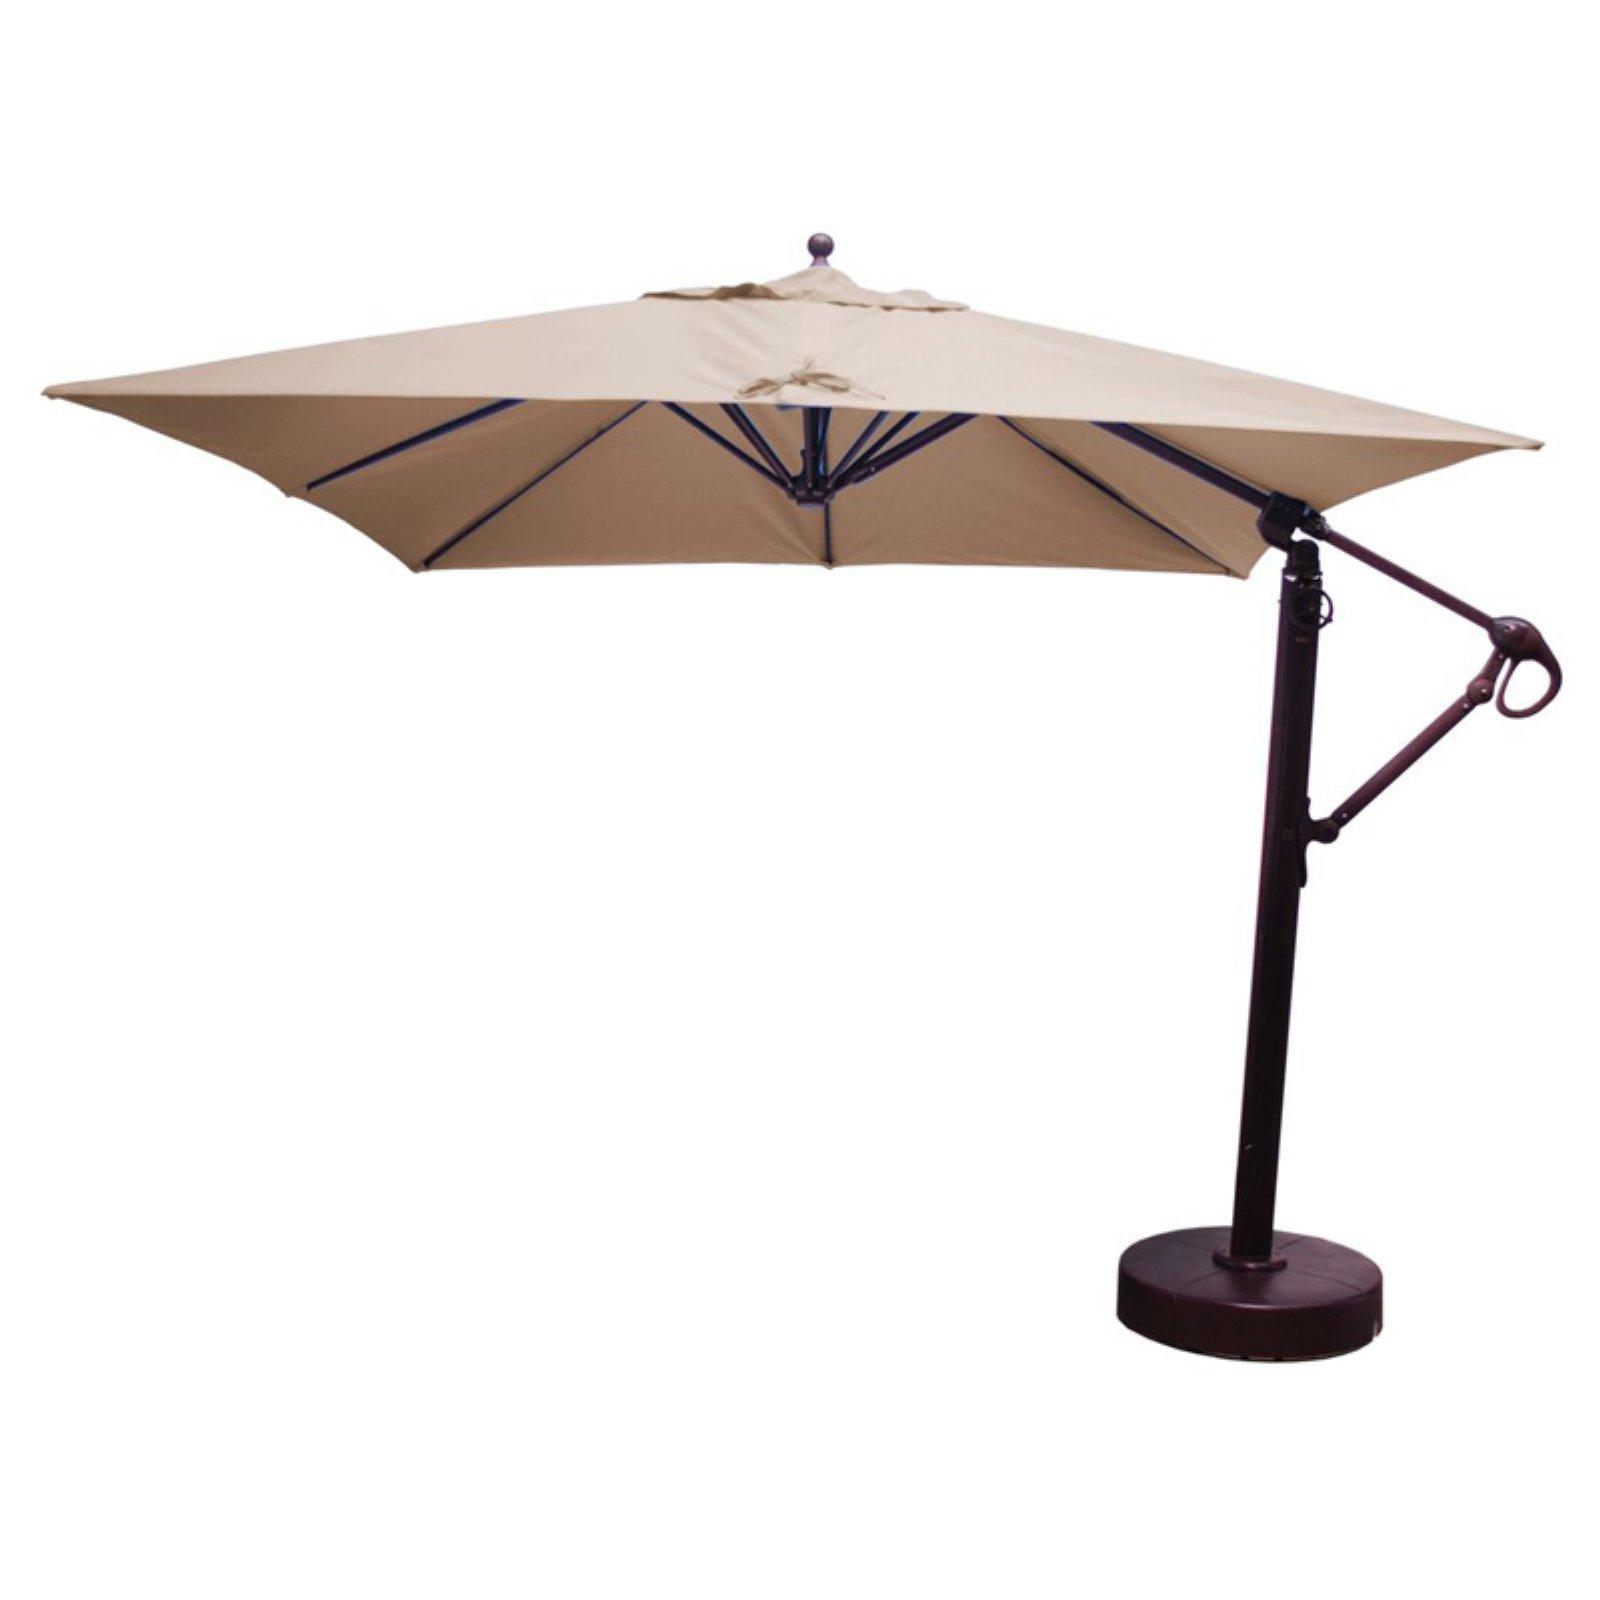 Galtech 10 Ft. Square Cantilever Sunbrella Aluminum Patio Umbrella Inside Well Liked Krystal Square Cantilever Sunbrella Umbrellas (Gallery 15 of 20)